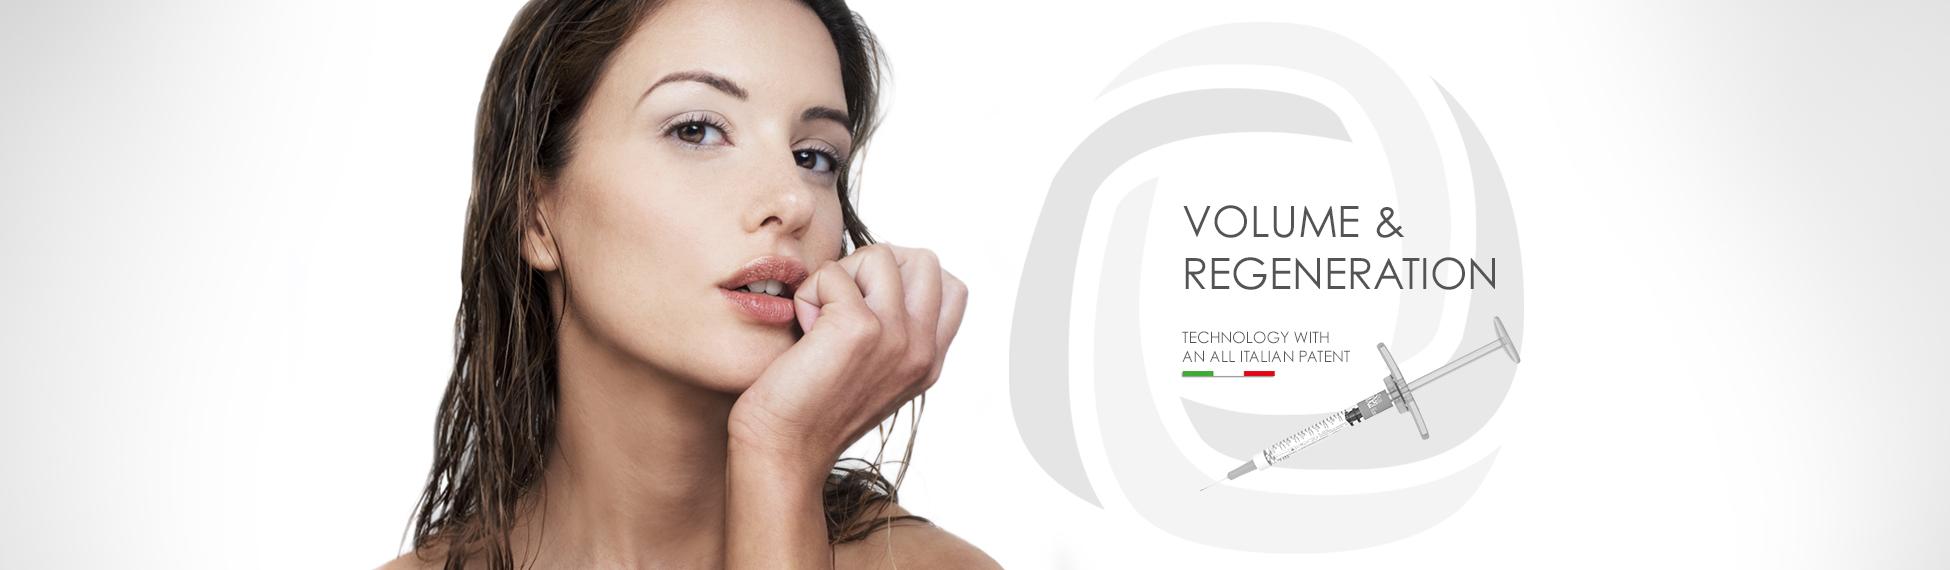 BIORIVOLUMETRIA, volume e regeneration, technology with an all italian patent